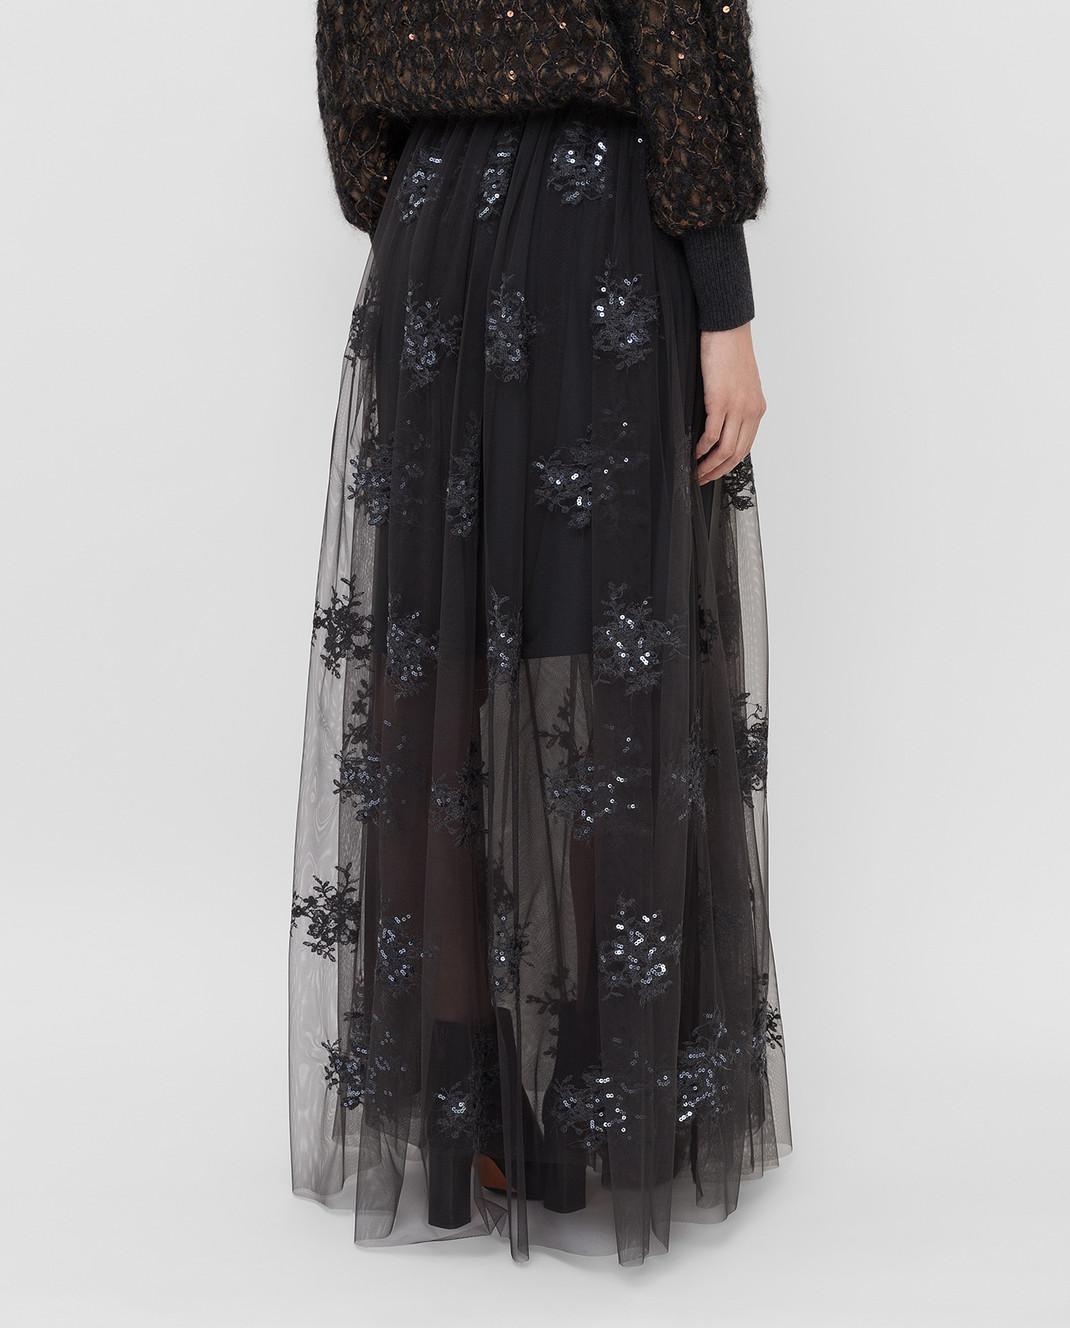 Brunello Cucinelli Темно-серая юбка MA960G2739 изображение 4